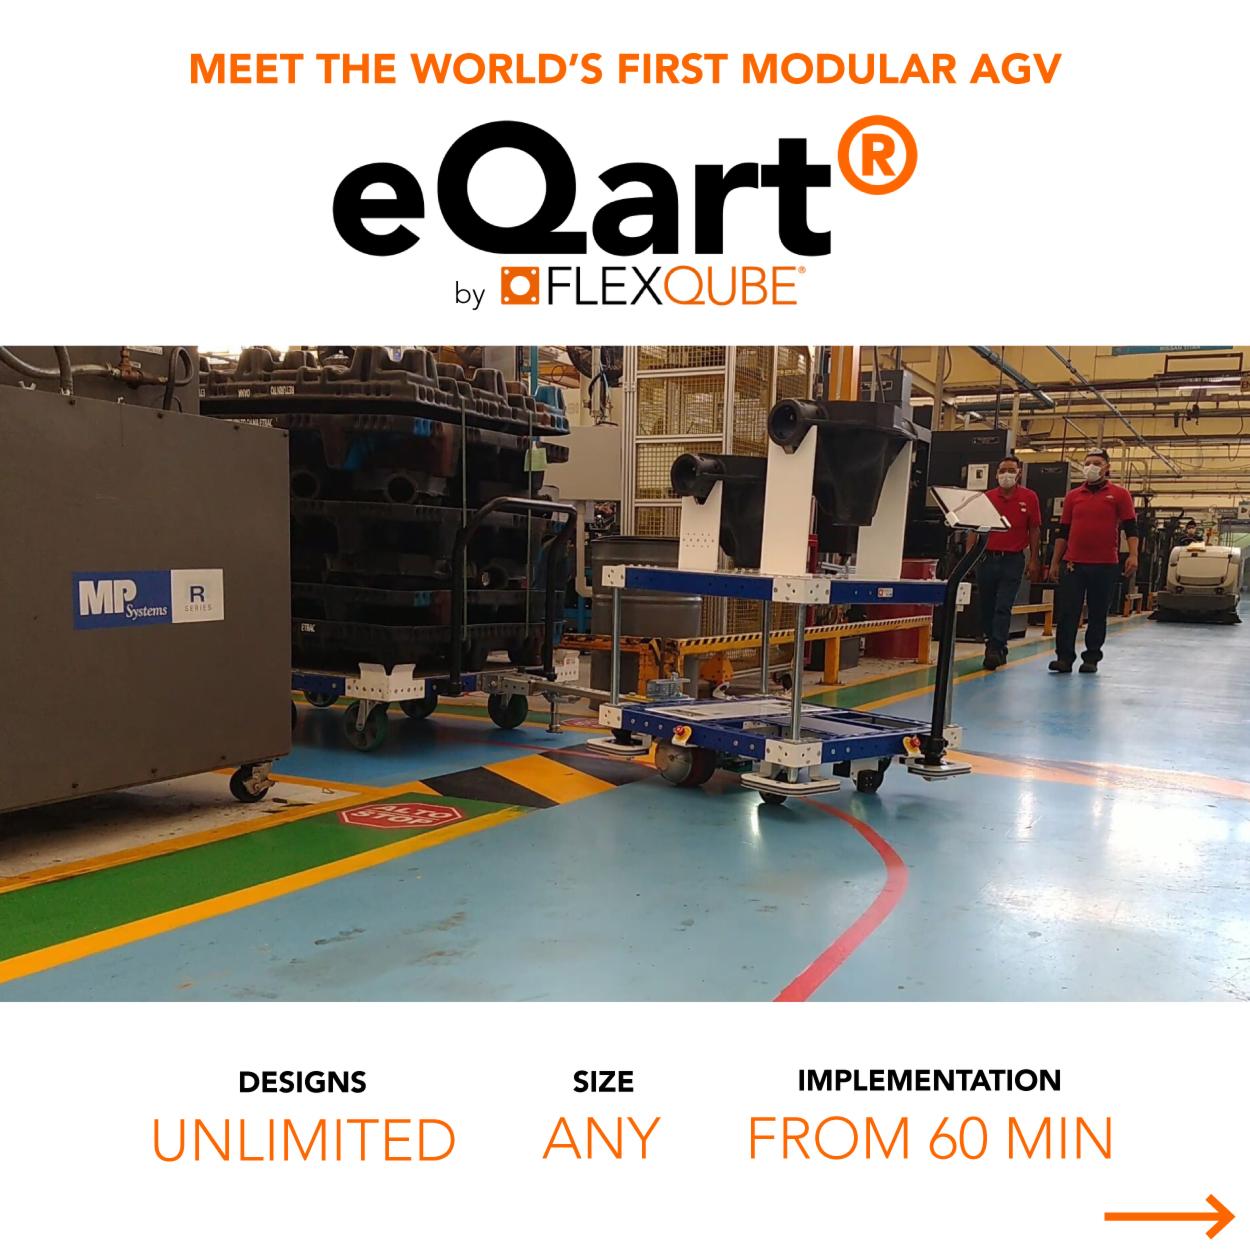 MEET THE WORLD'S FIRST MODULAR AGV, THE e Qart BY FLEXQUBE